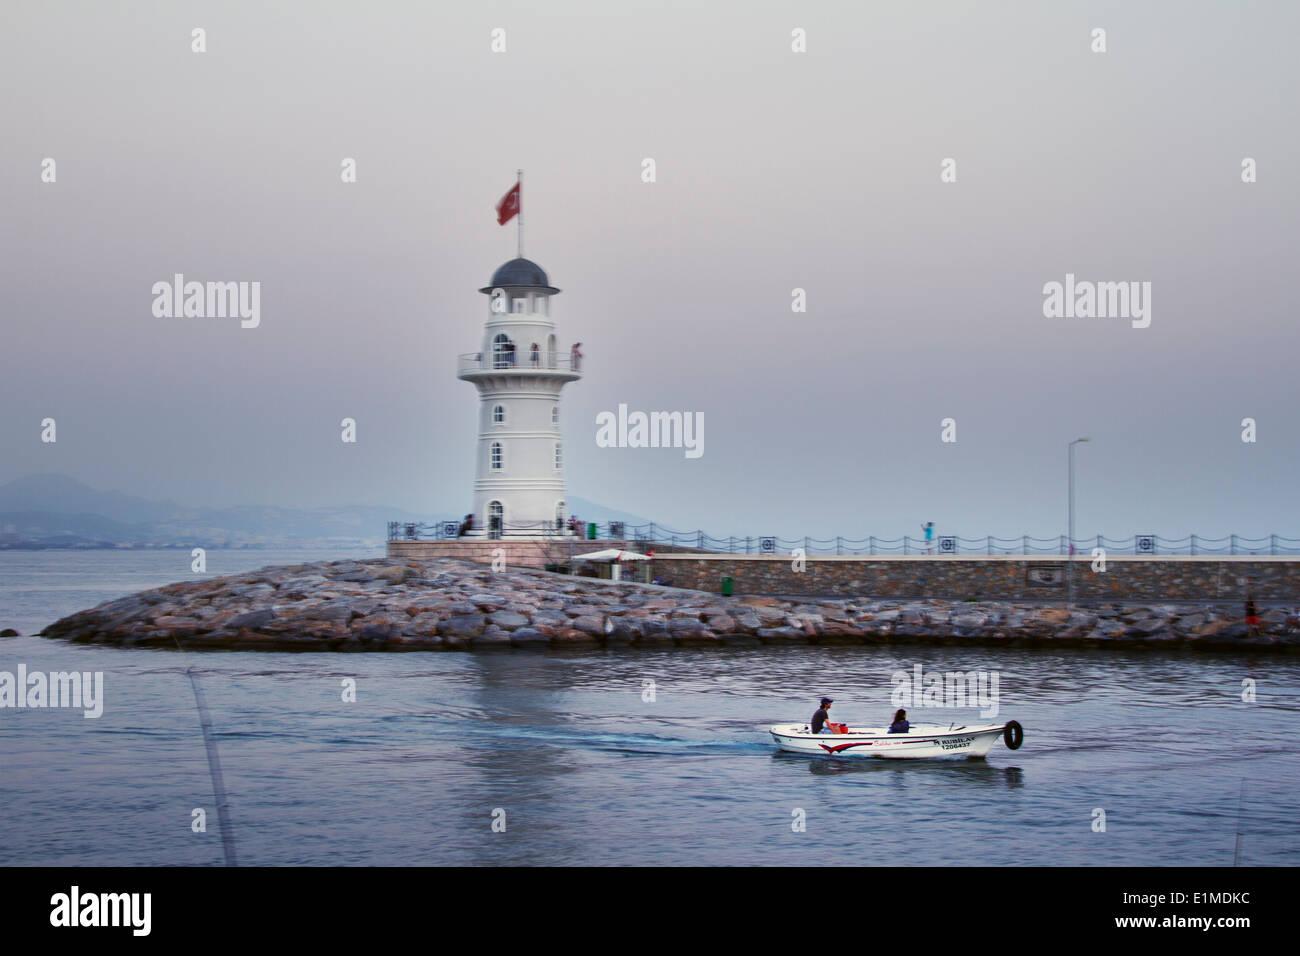 Turkey Alanya Night Sunset Light Sea Mediterranean People View Panorama City Dock Harbour Boat Lighthouse Couple Romantic Trip - Stock Image